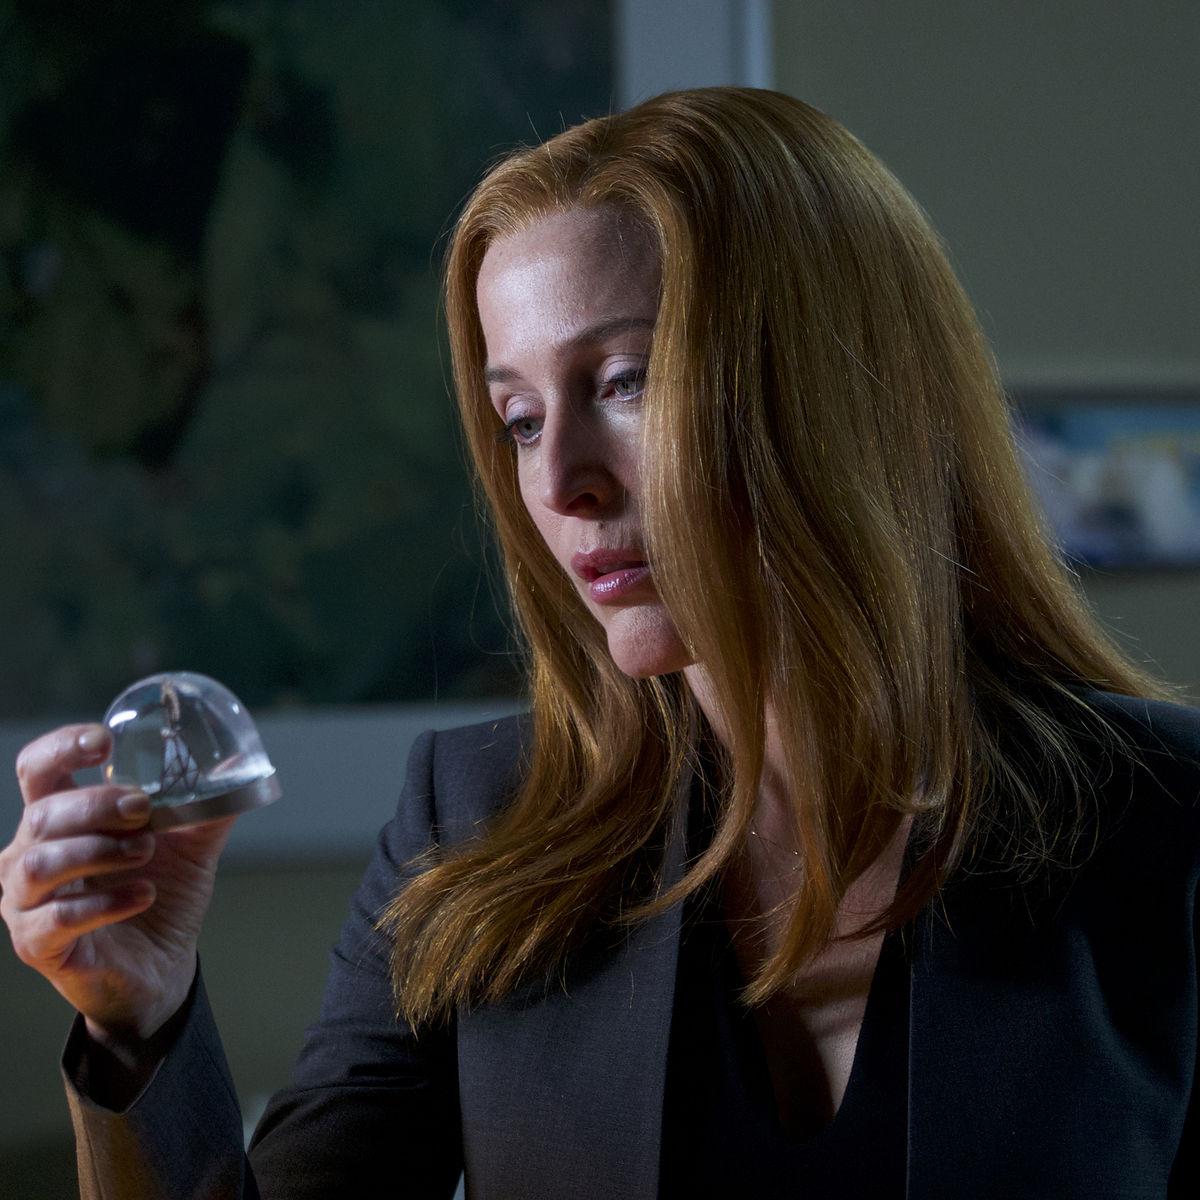 X-Files episode 1105 Ghouli